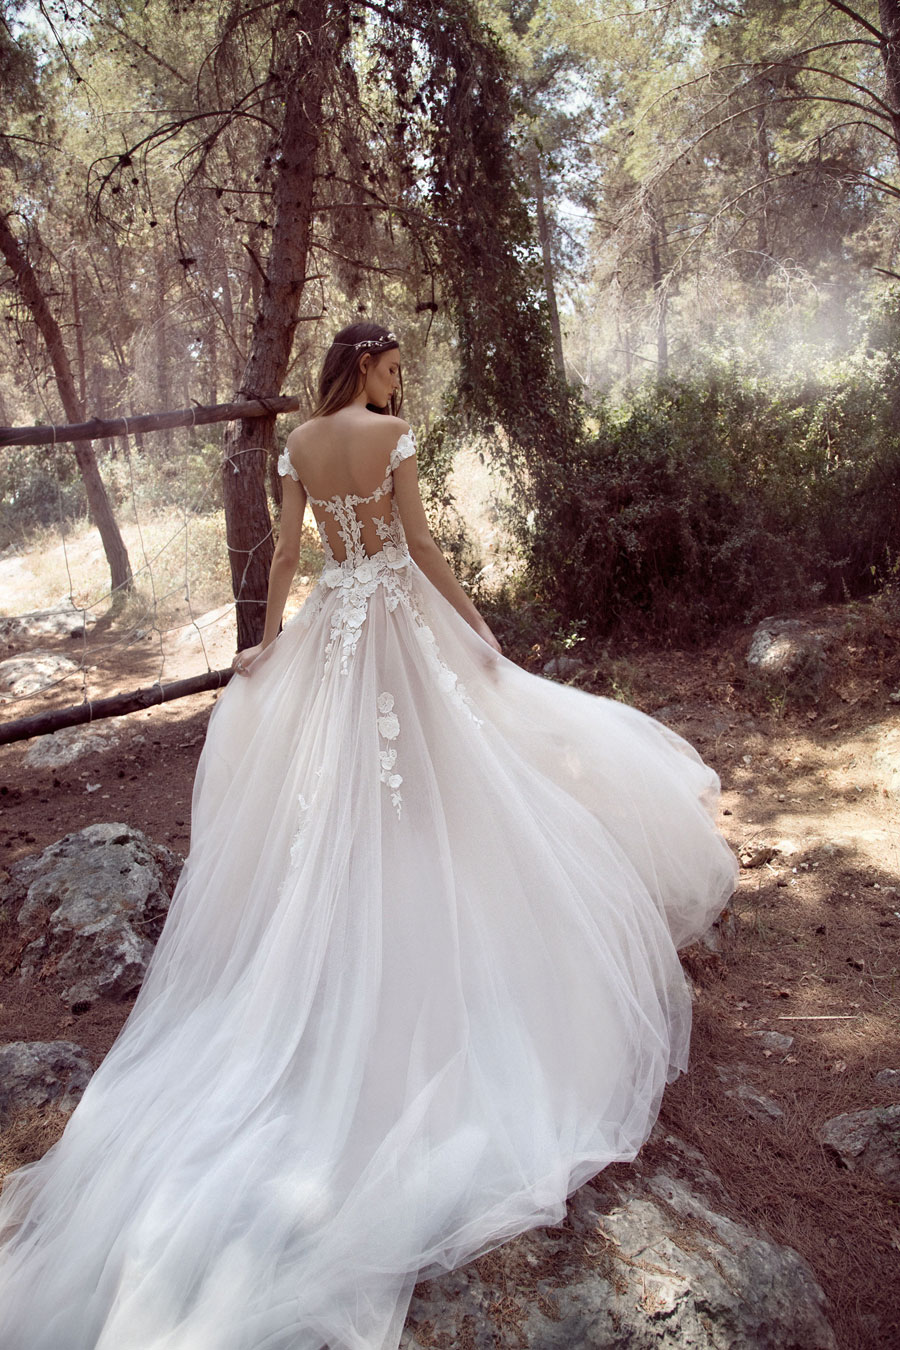 Wedding Dresses for the Urban-Boho Bride- Gala Collection No. IV0005